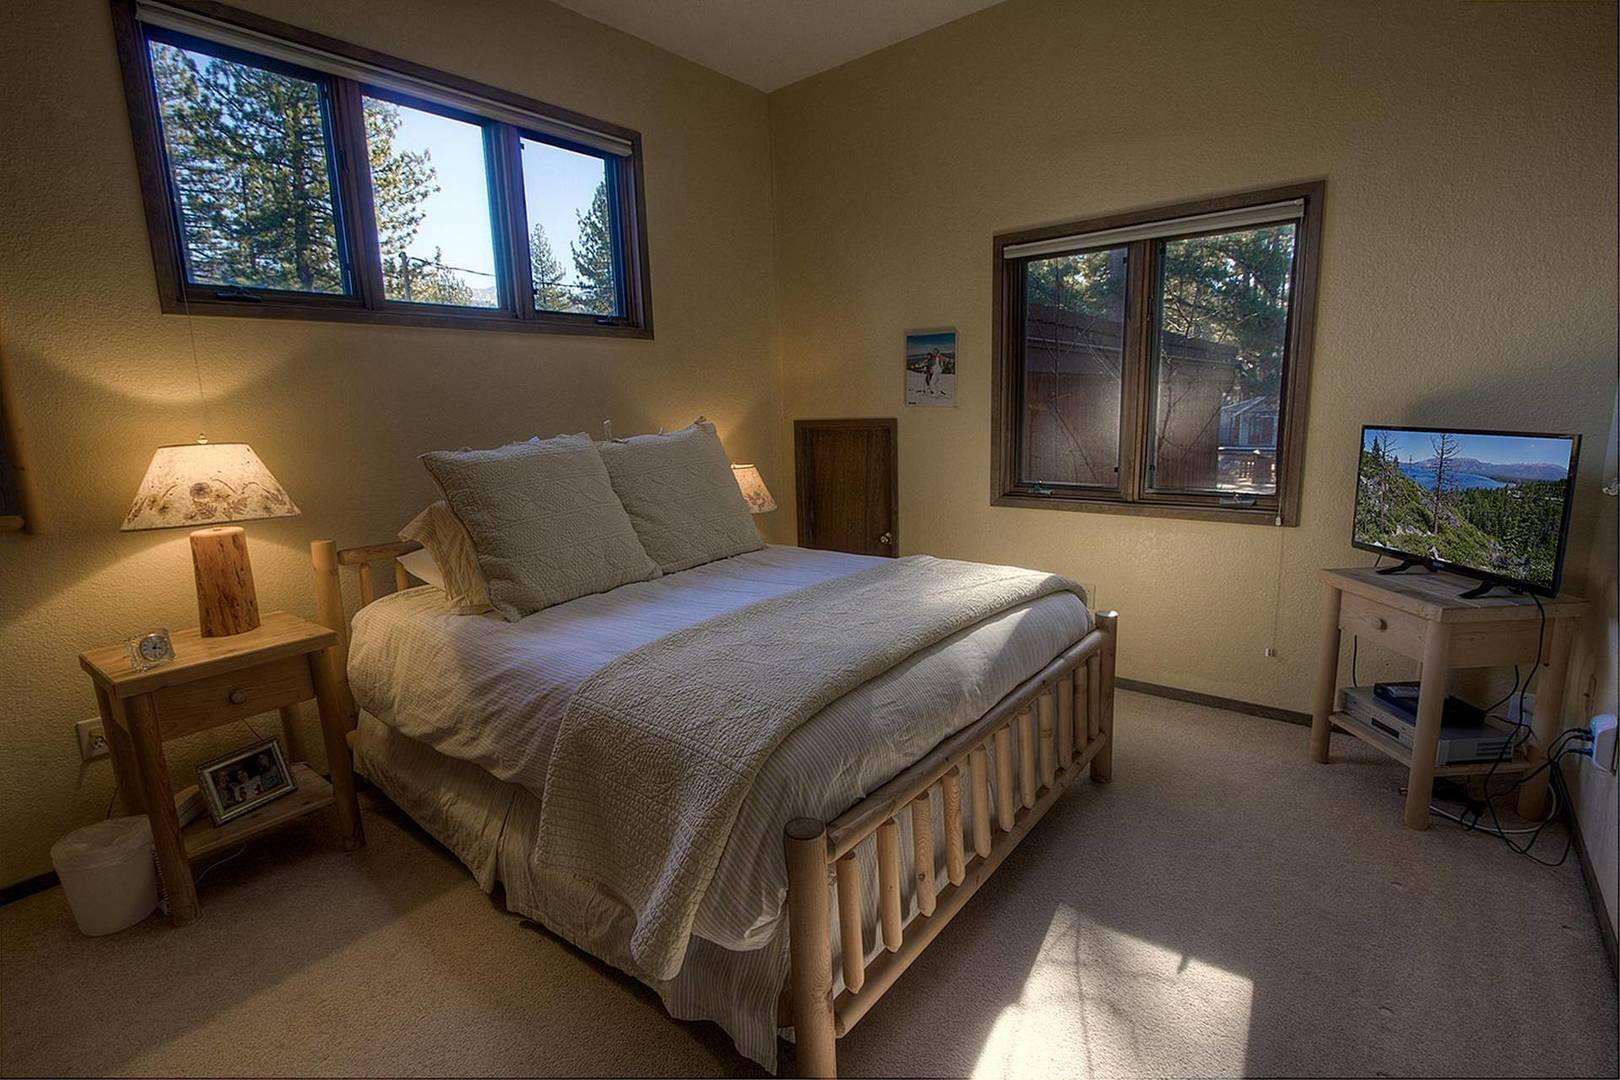 cyh1281 bedroom